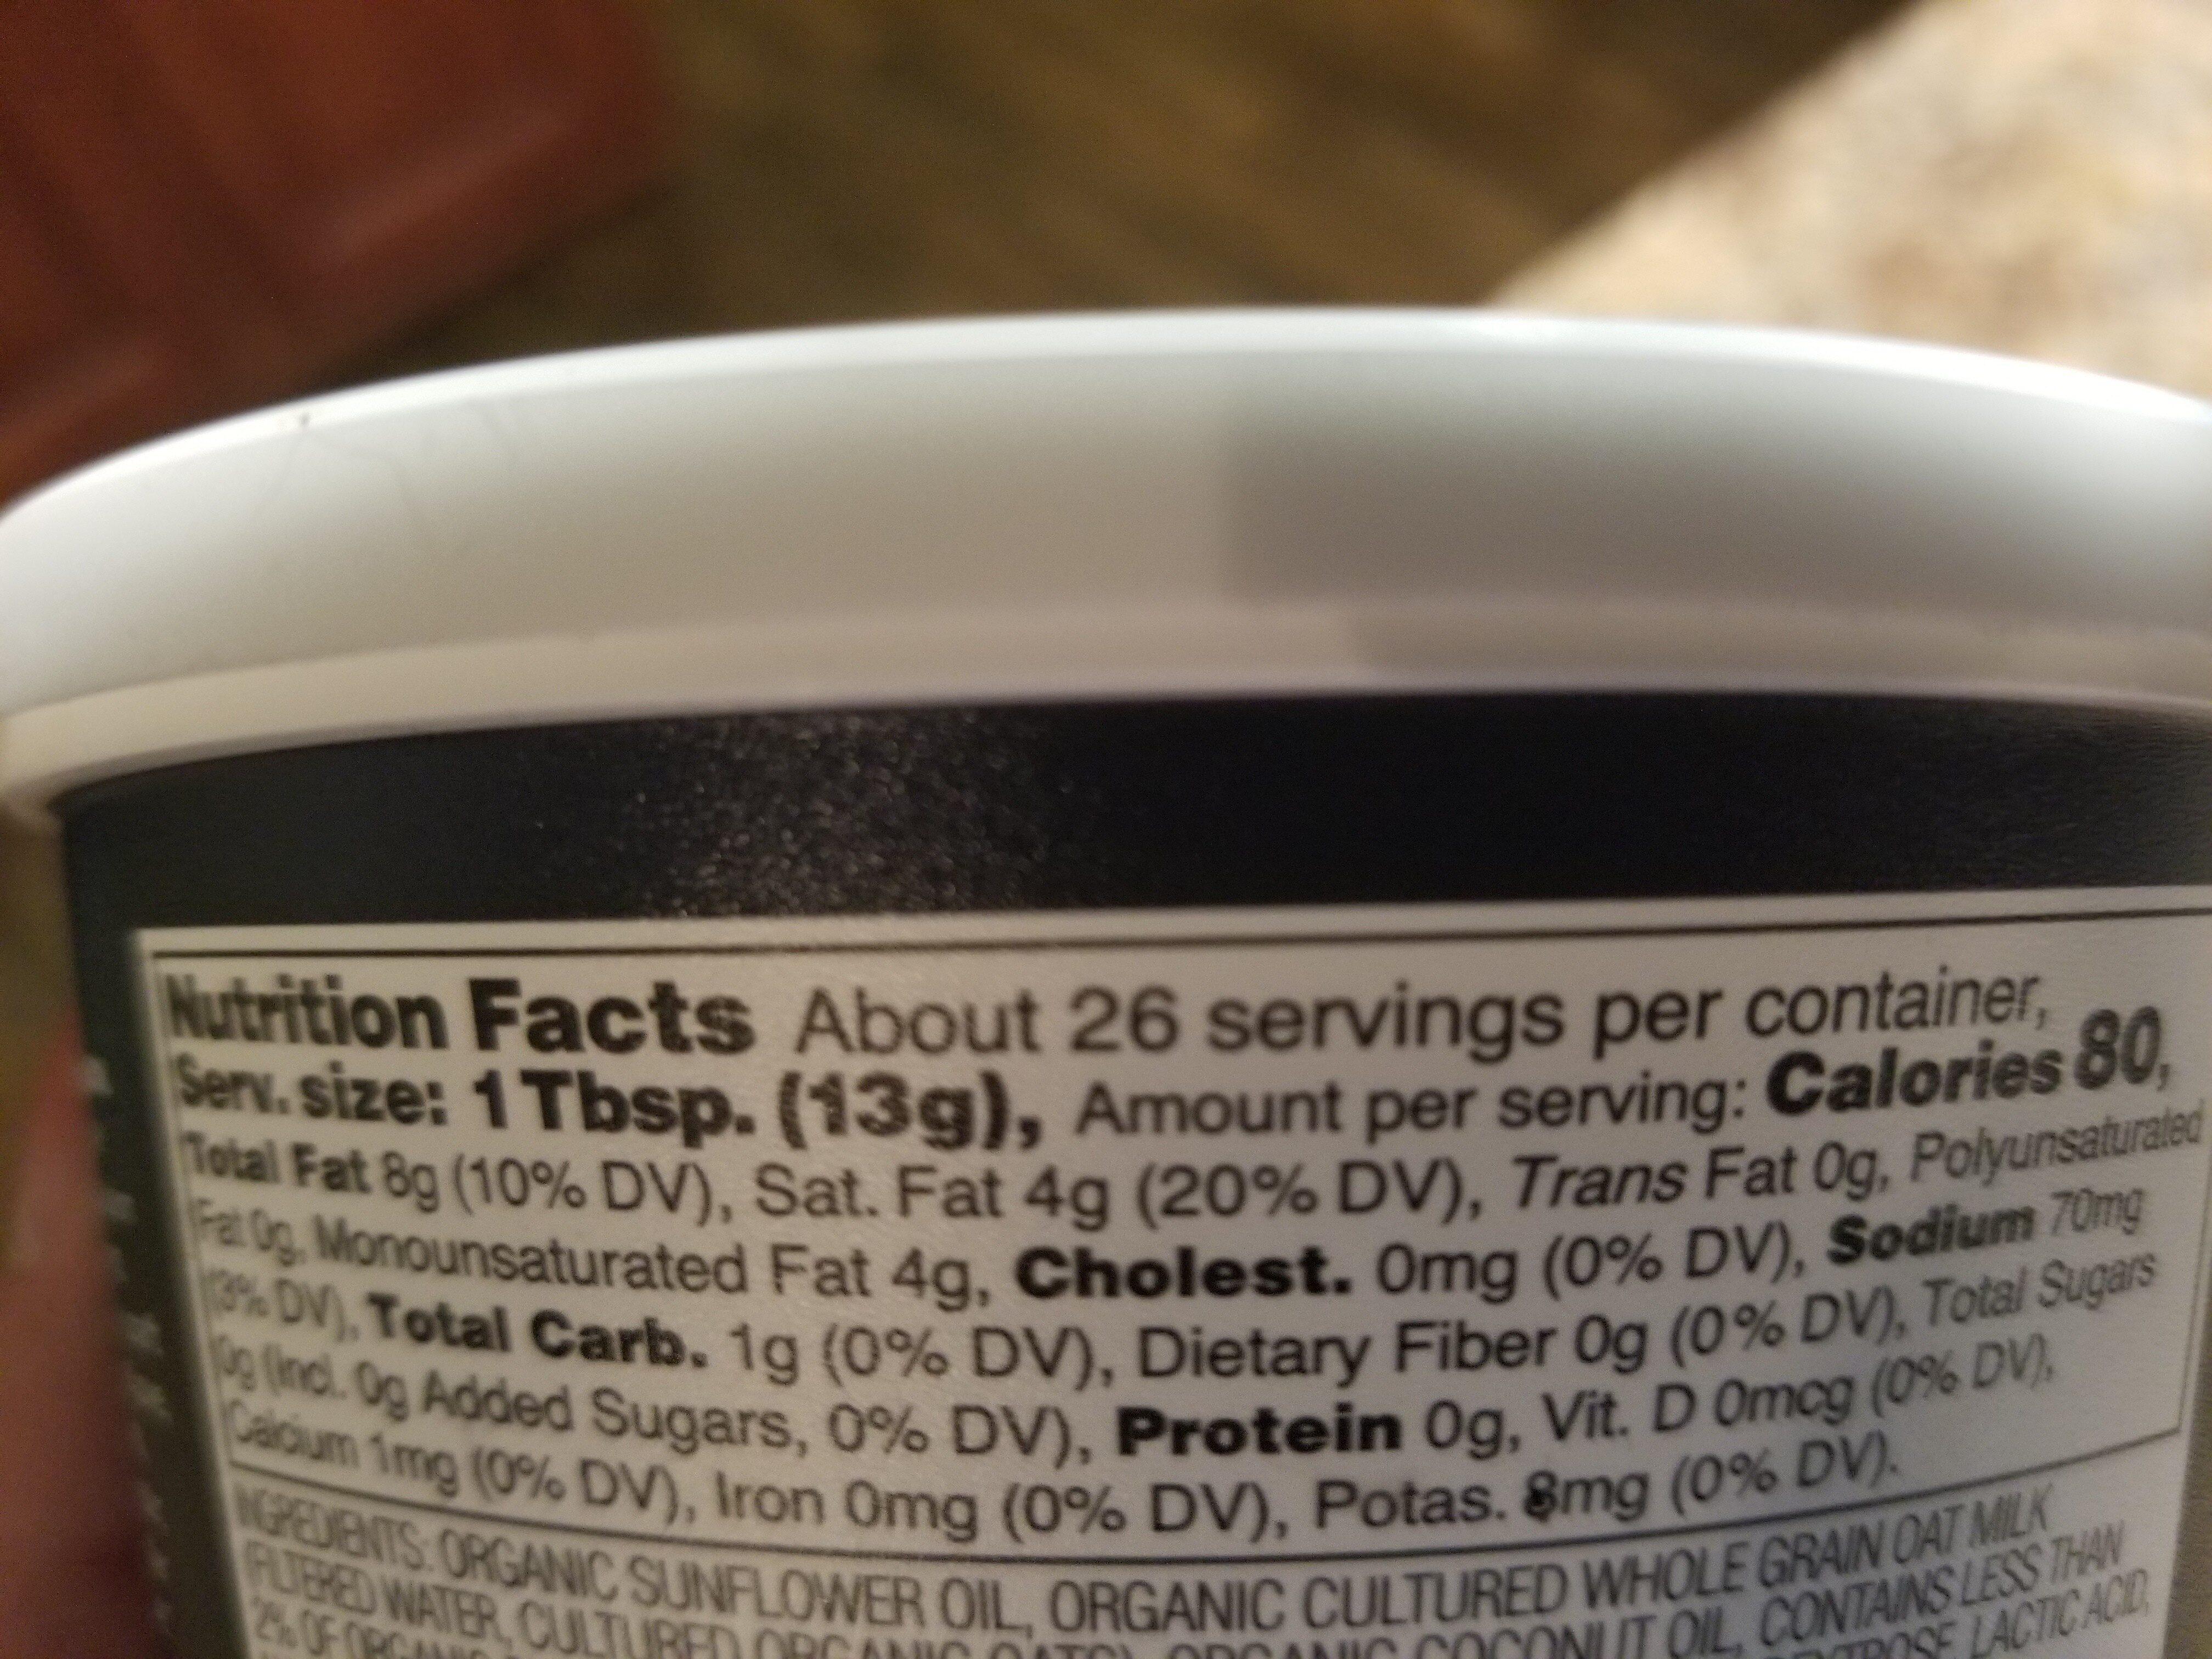 Hint of sea salt cultured vegan oat milk butter - Nutrition facts - en